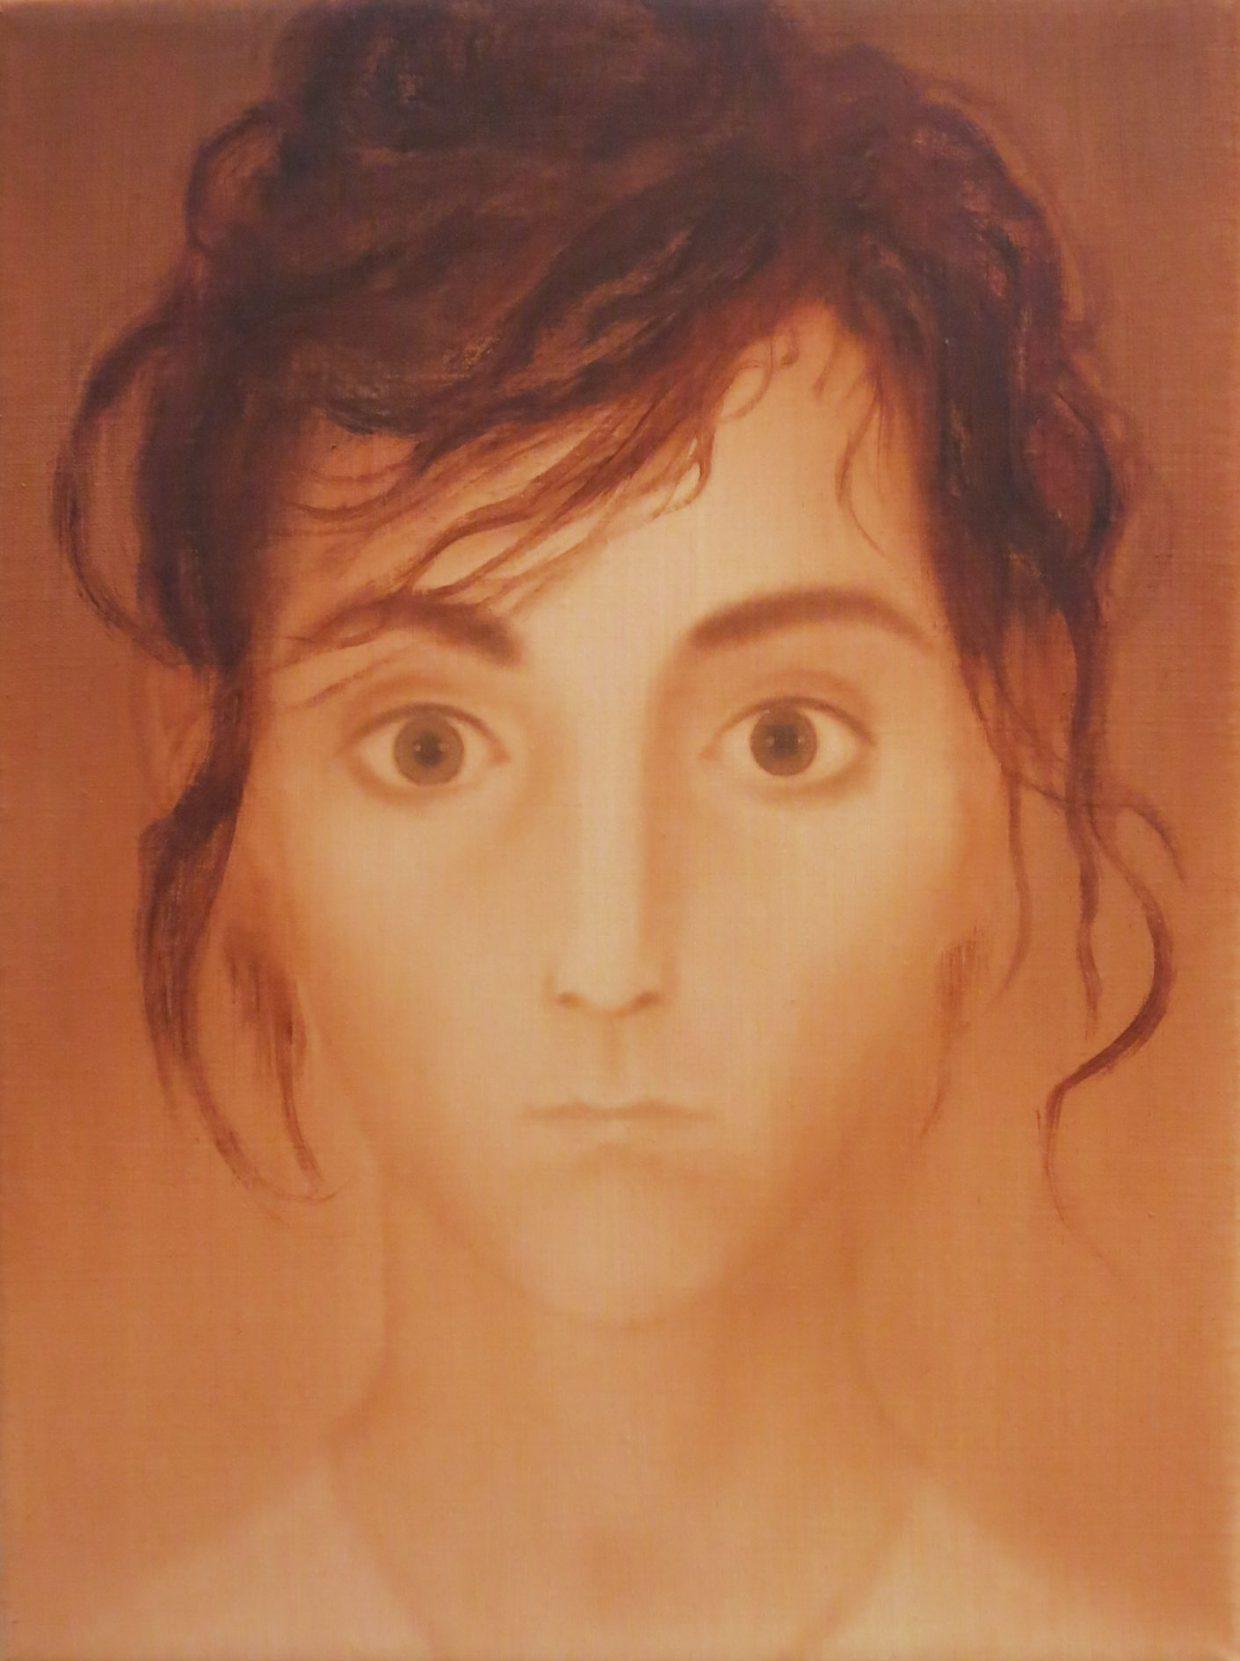 Malgorzata Neubart, Julia, Öl auf Lw., 24 x 18 cm, 2015